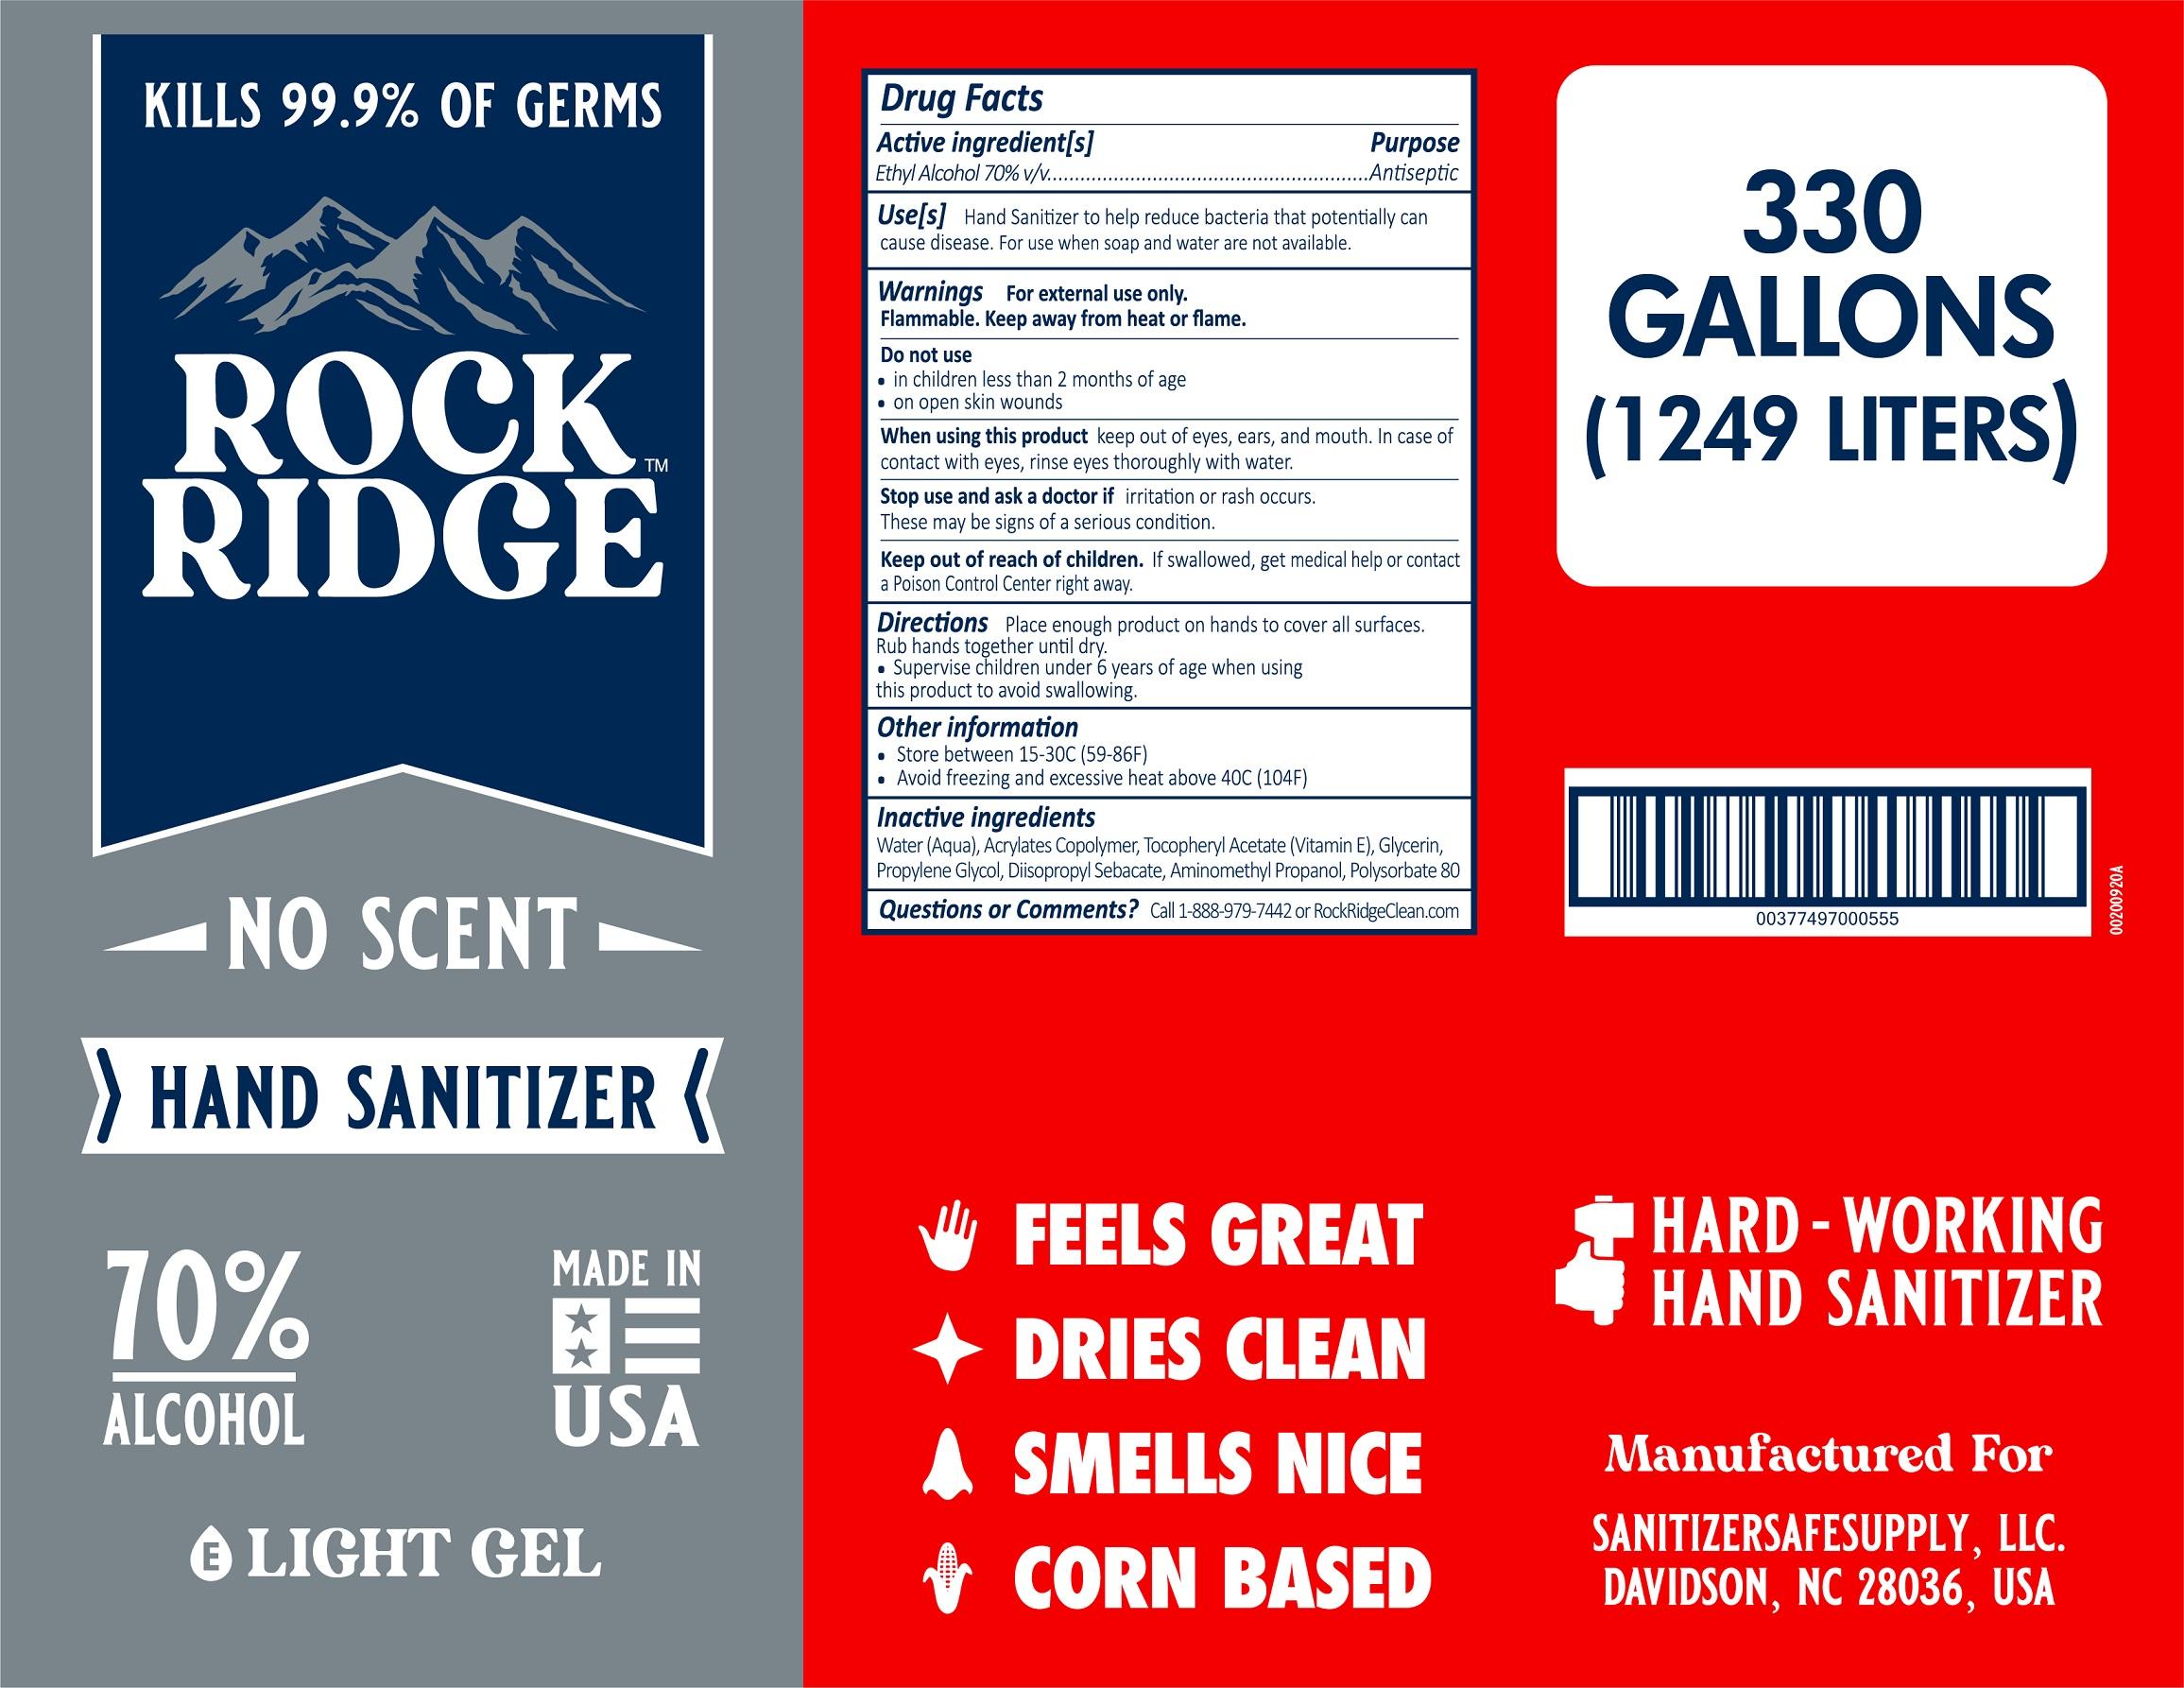 RockRidge Unscented 330gal